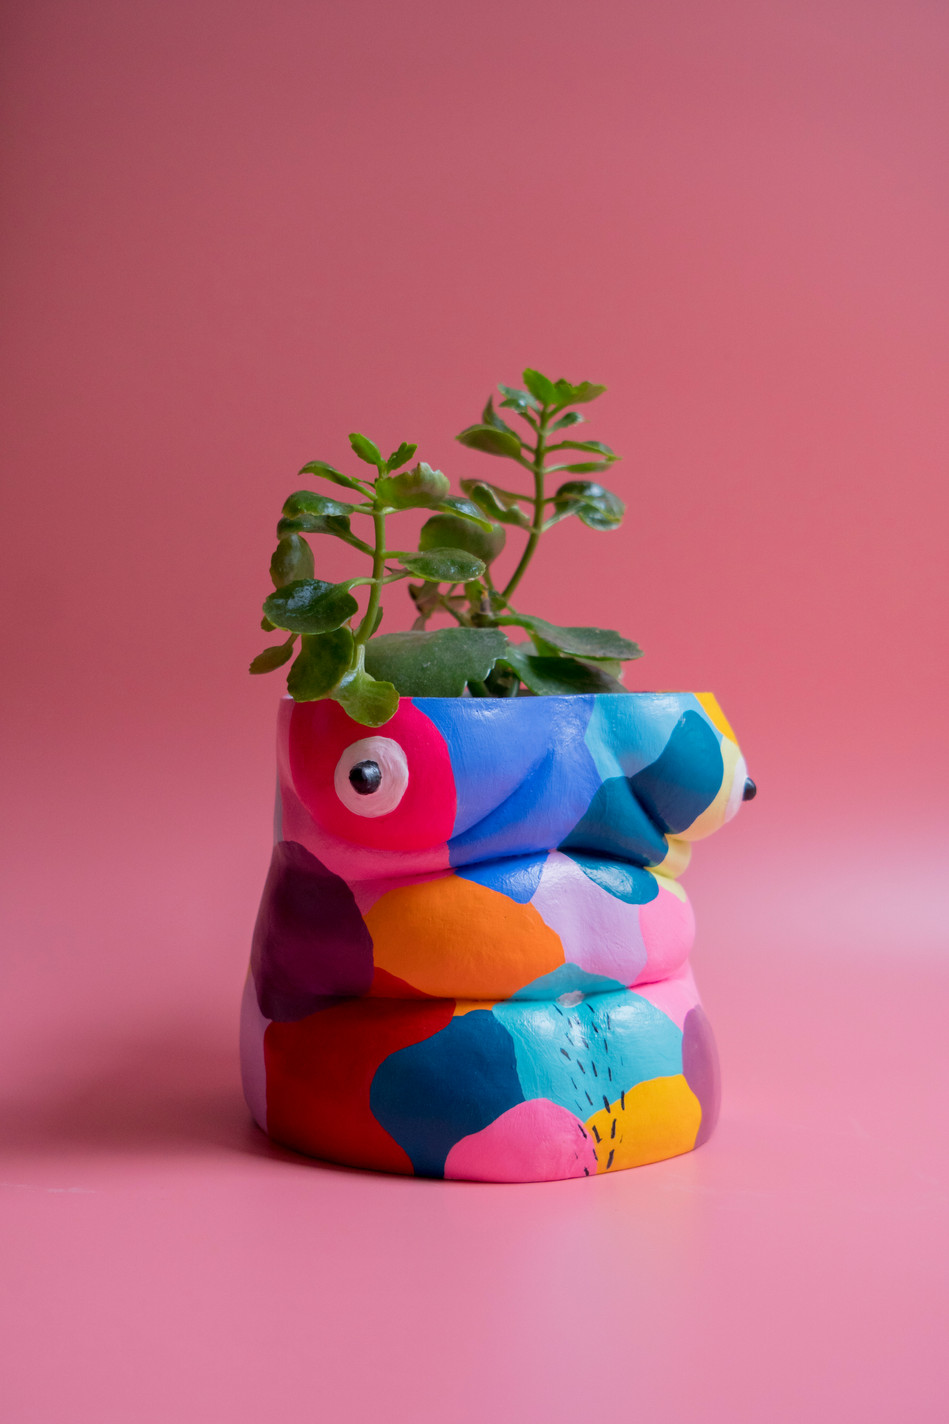 Pot Belly by Meg Garrod X Sam Dawood